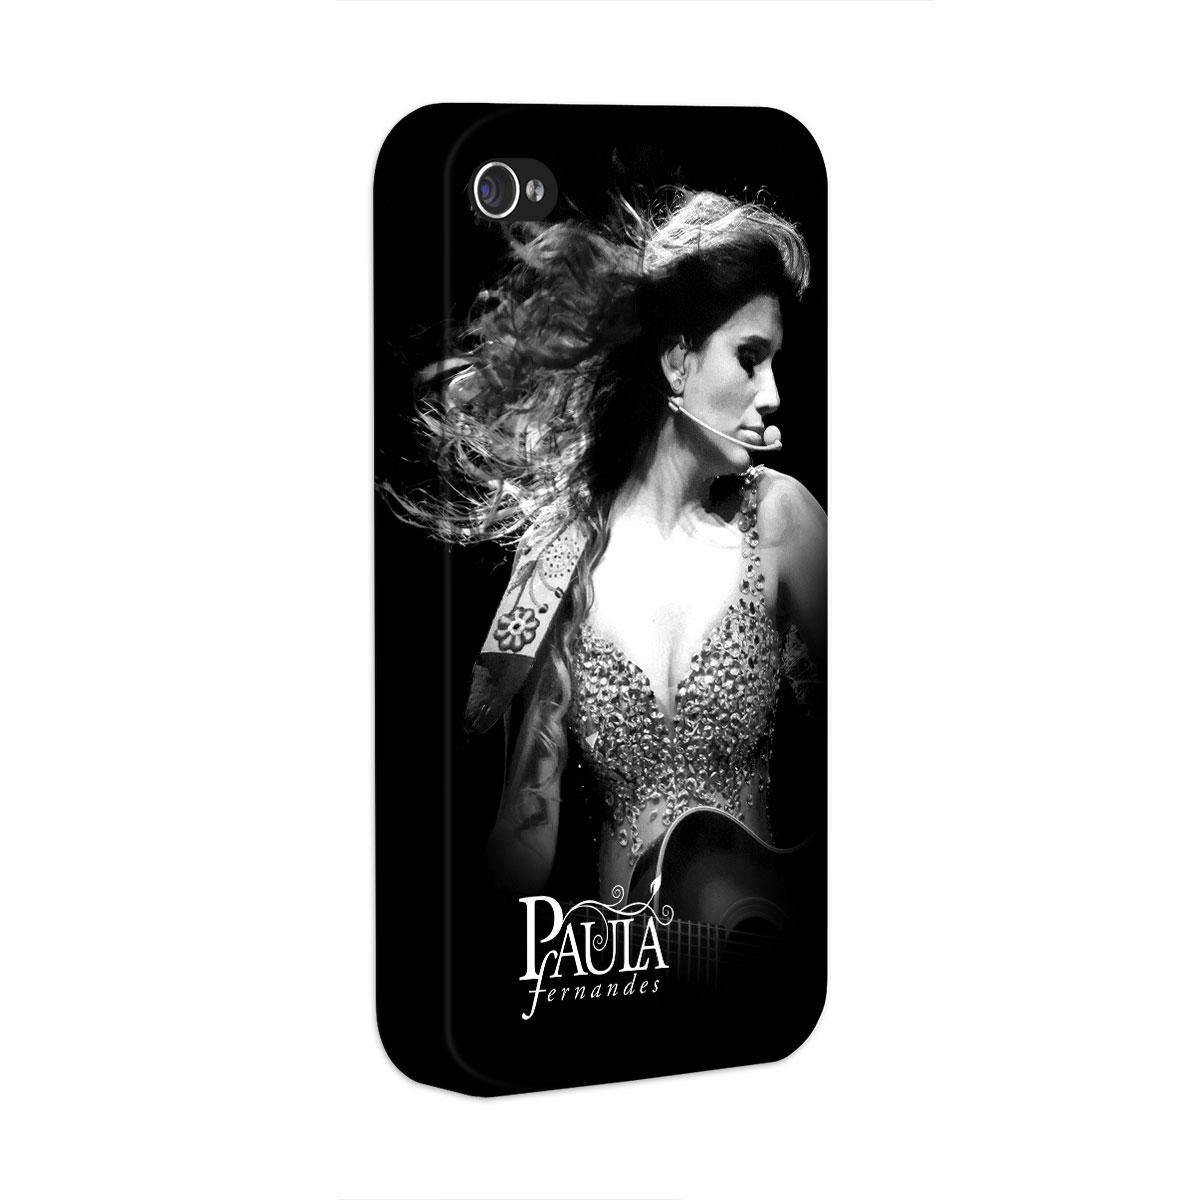 Capa para iPhone 4/4S Paula Fernandes Foto